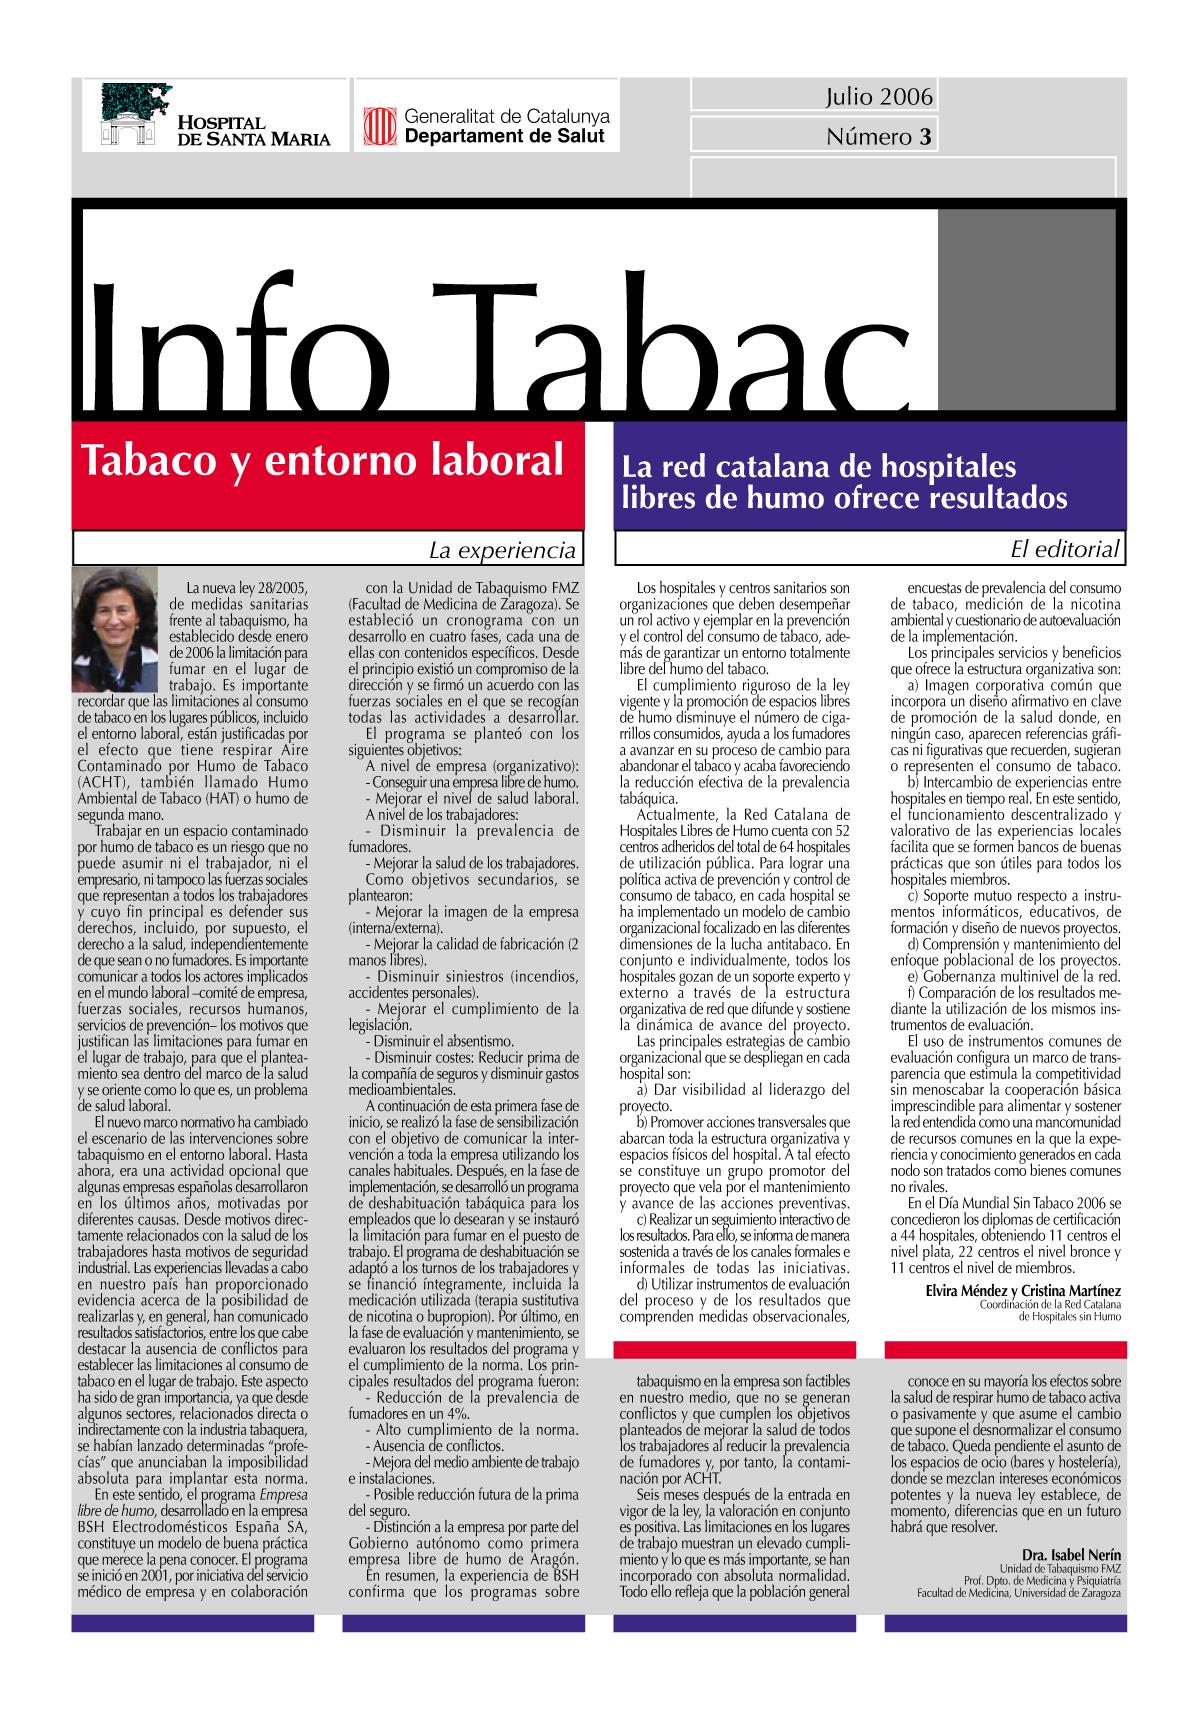 Info Tabac nº3 - Julio 2006